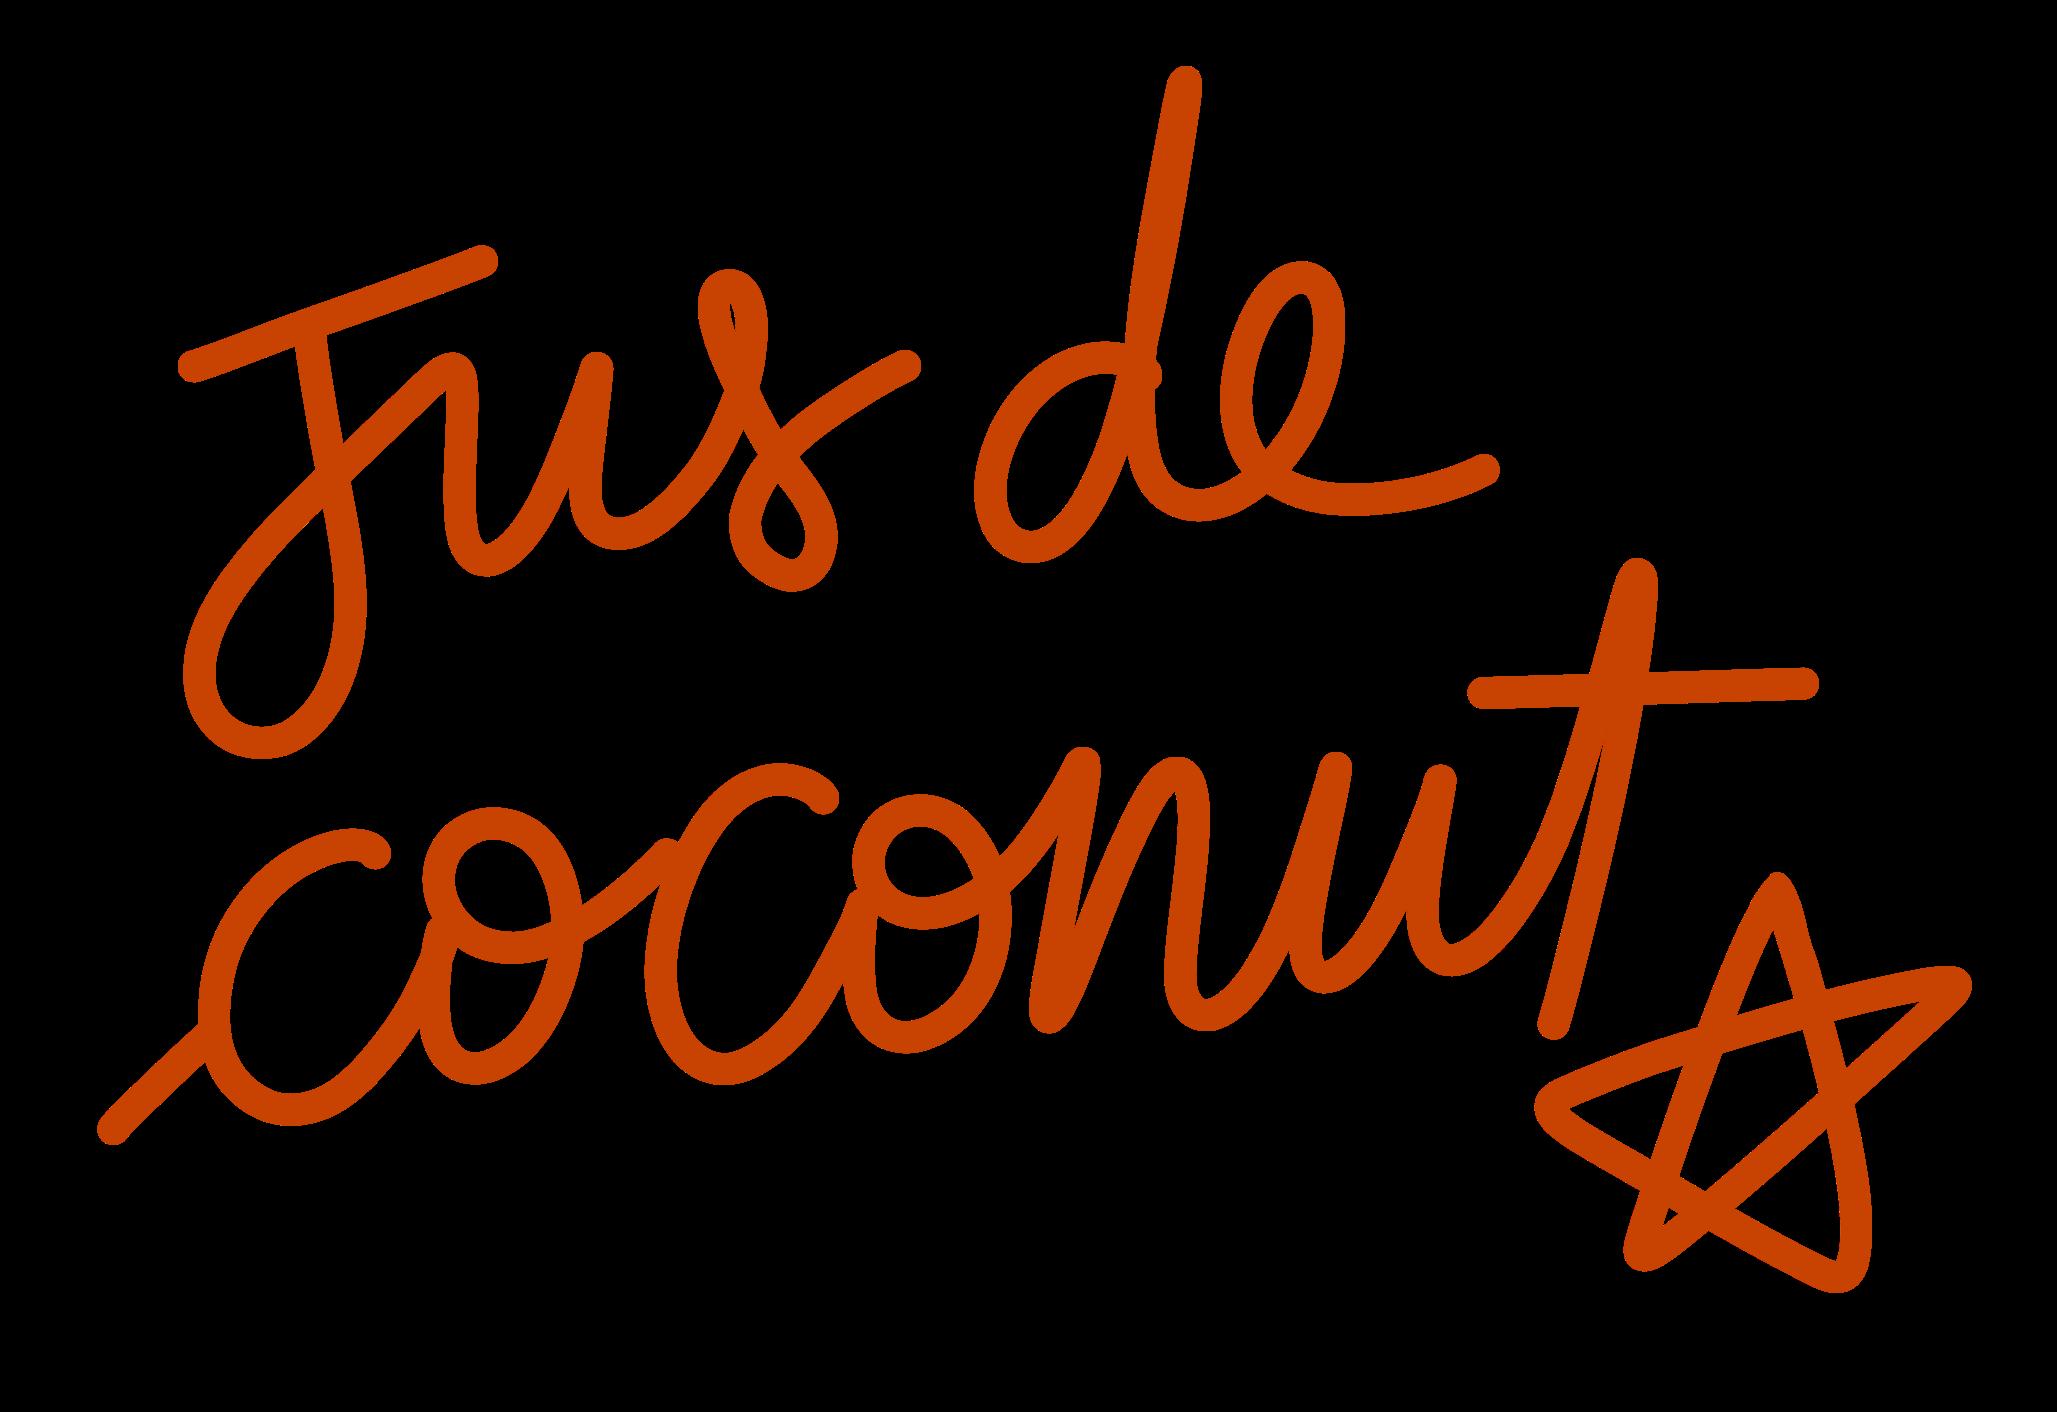 jusdecoconut